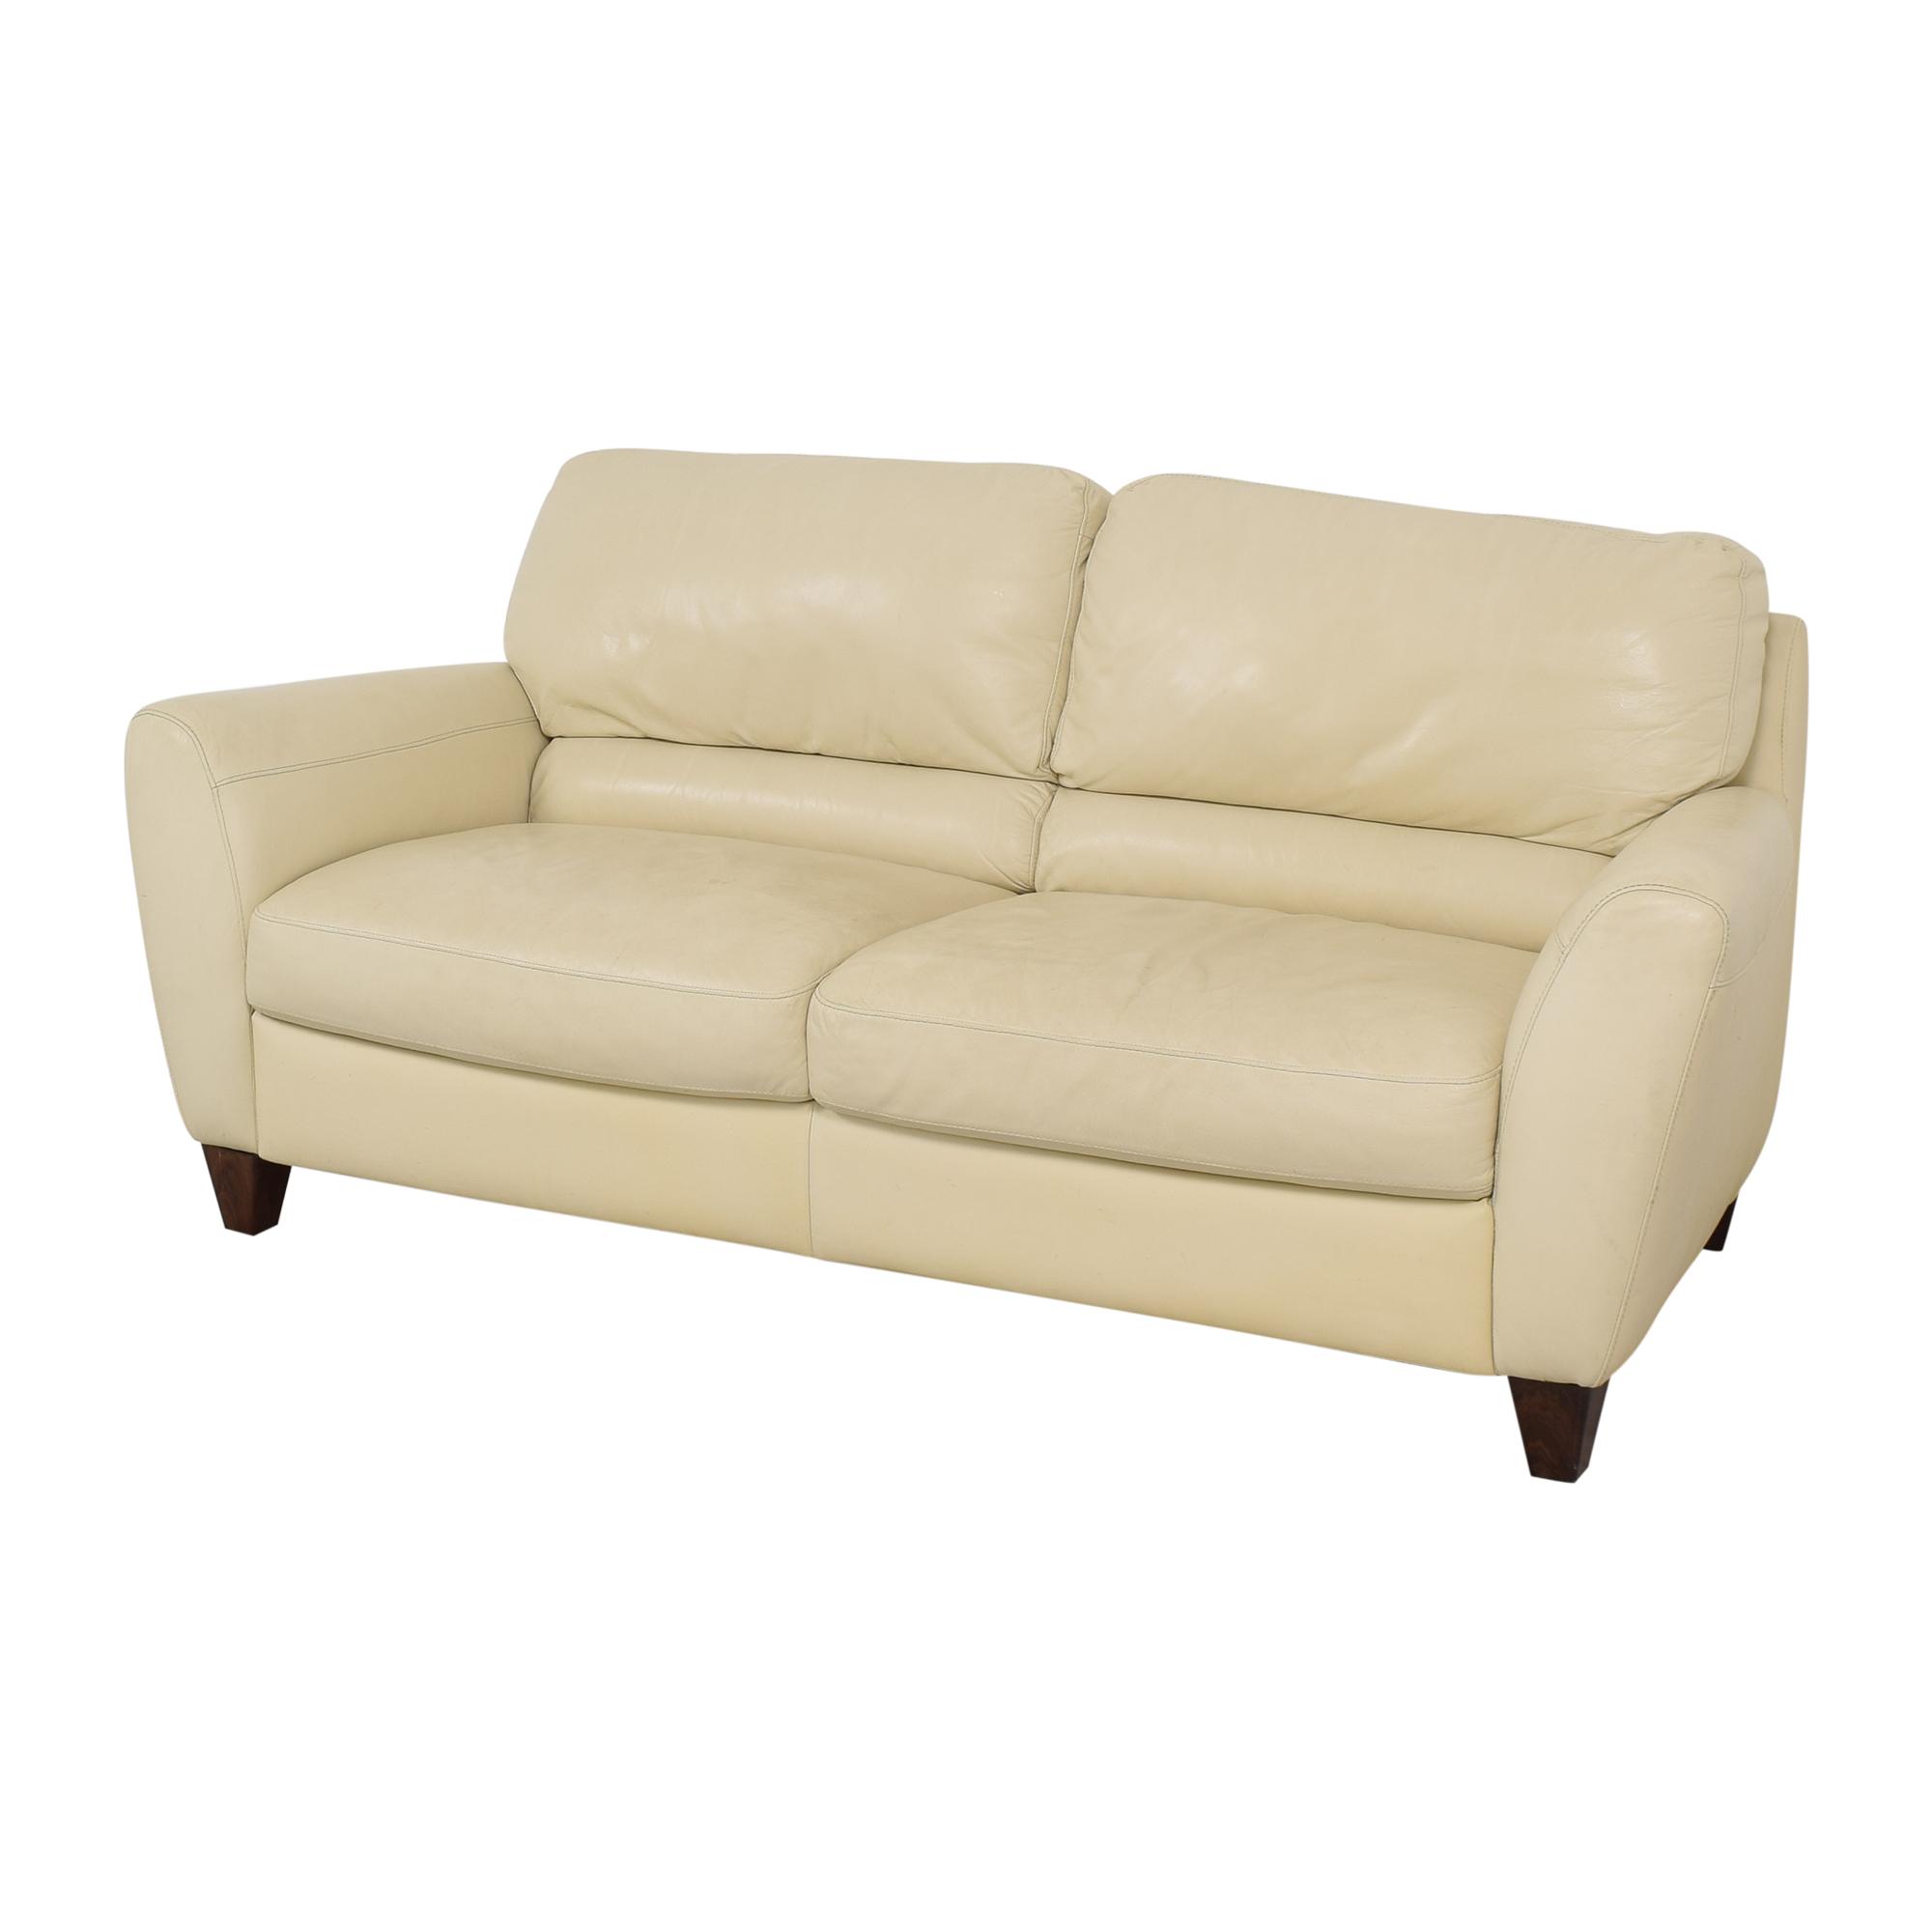 Macy's Macy's Italsofa Two Cushion Sofa on sale